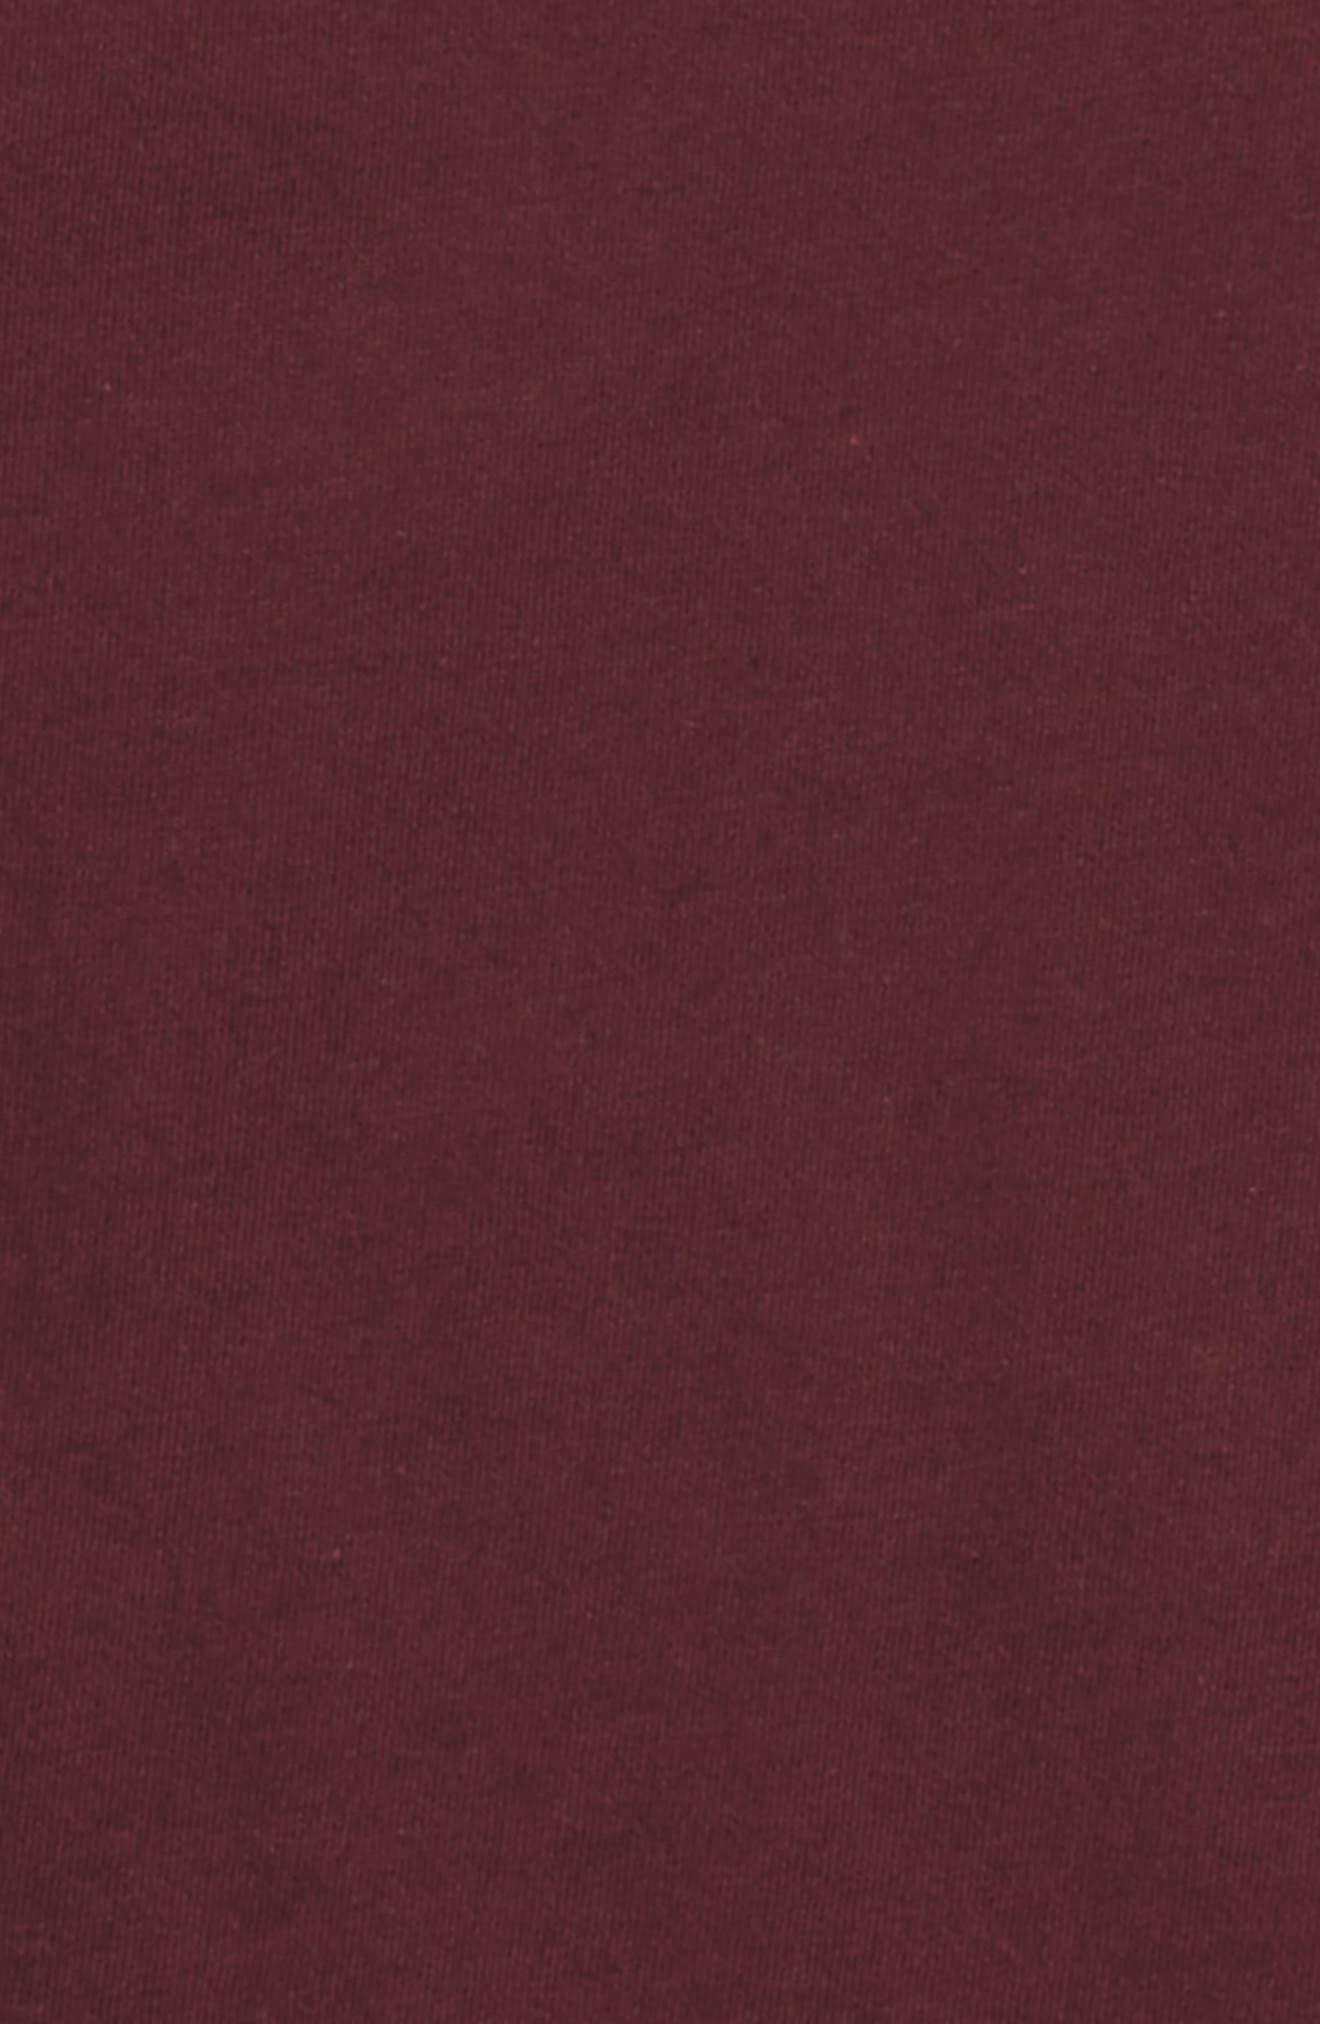 V-Neck Organic Cotton T-Shirt,                             Alternate thumbnail 2, color,                             Deep Autumn